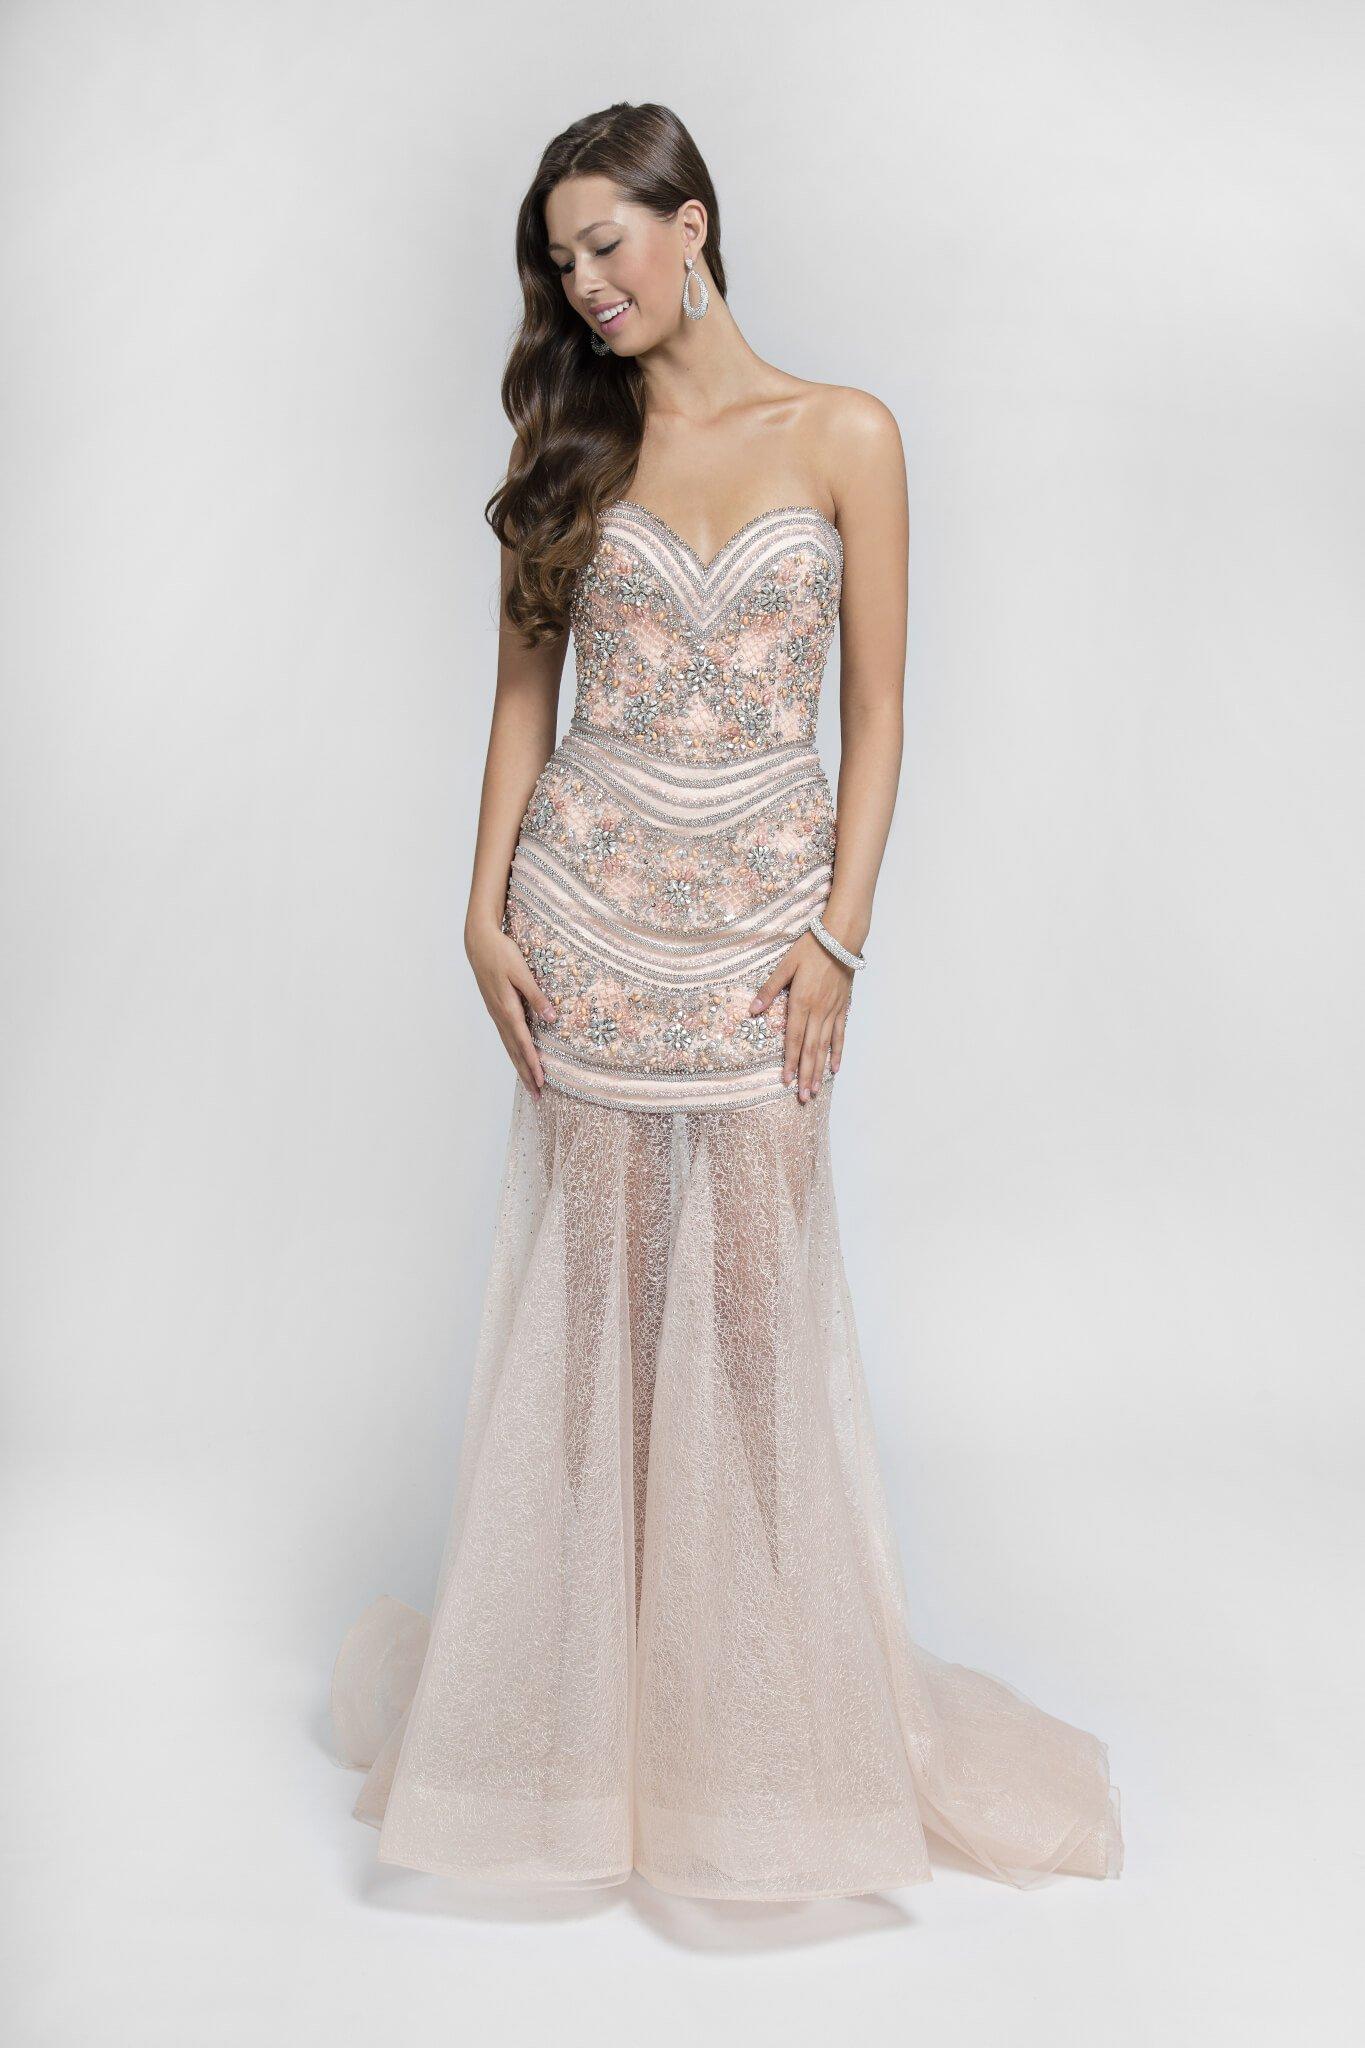 Prom dress stores in north miami